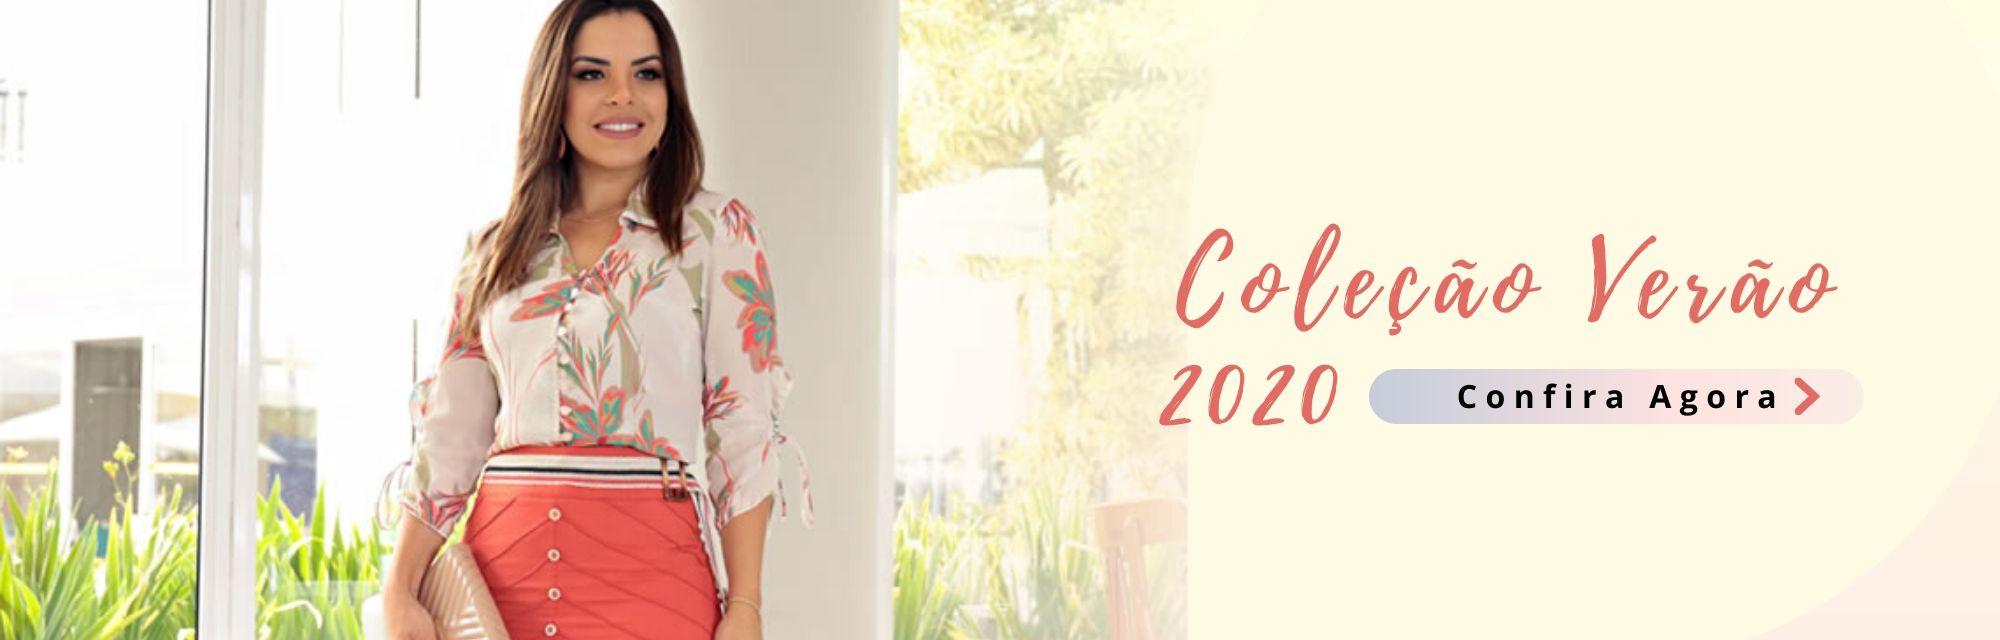 moda evangelica verão 2020 by sophi